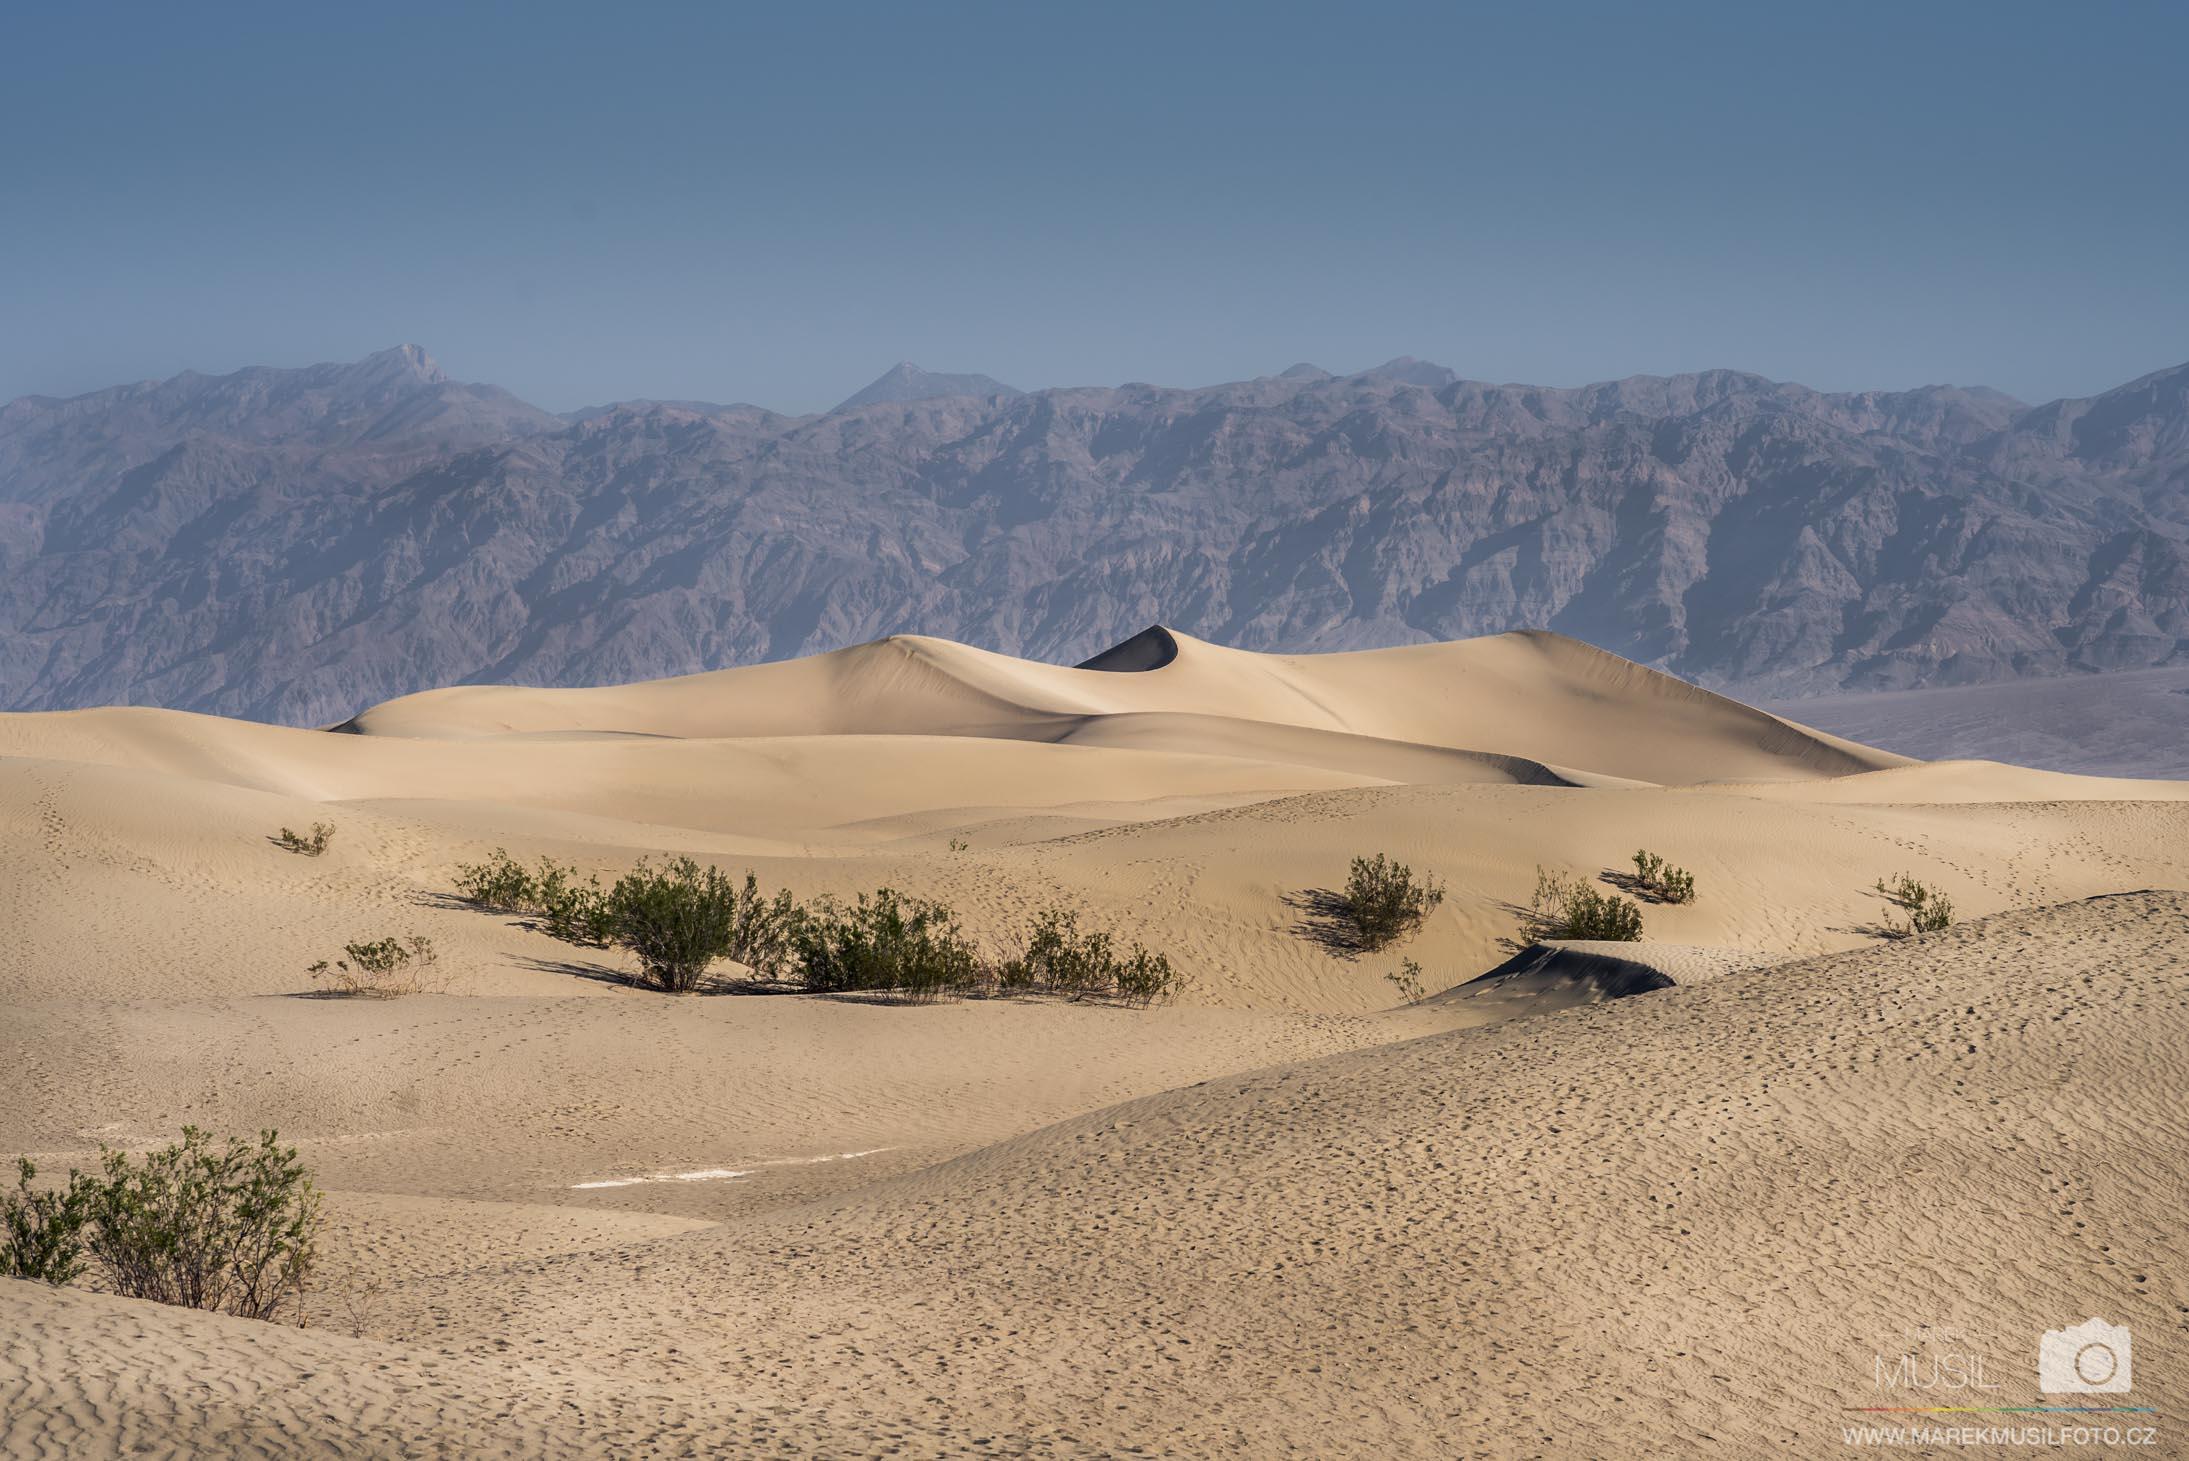 Mesquite Flat Sand Dunes Star Wars